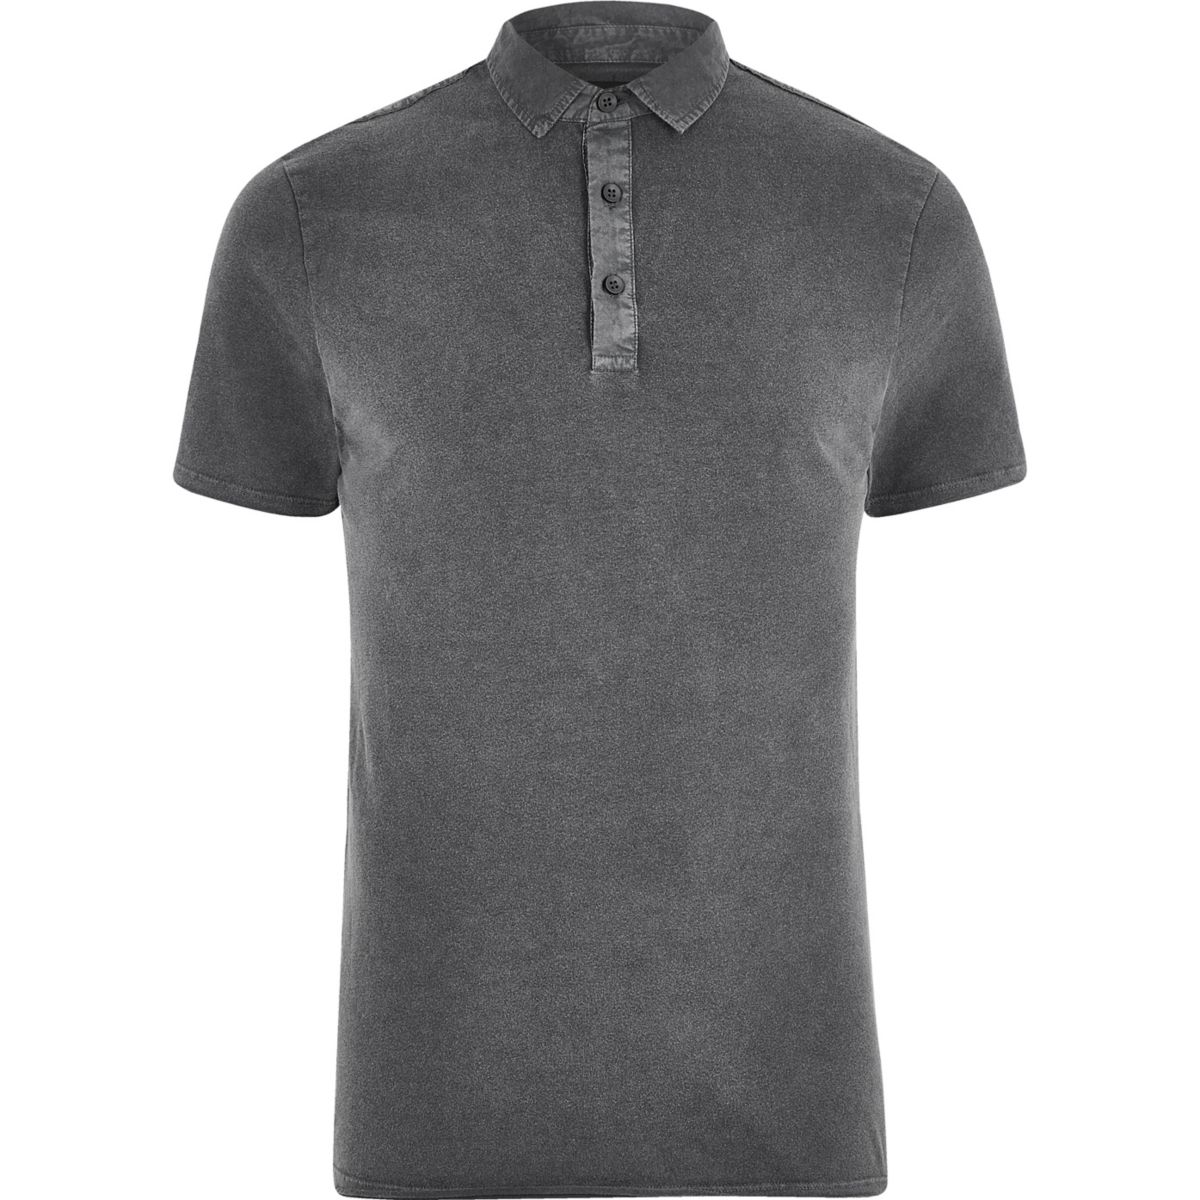 Black washed slim fit polo shirt